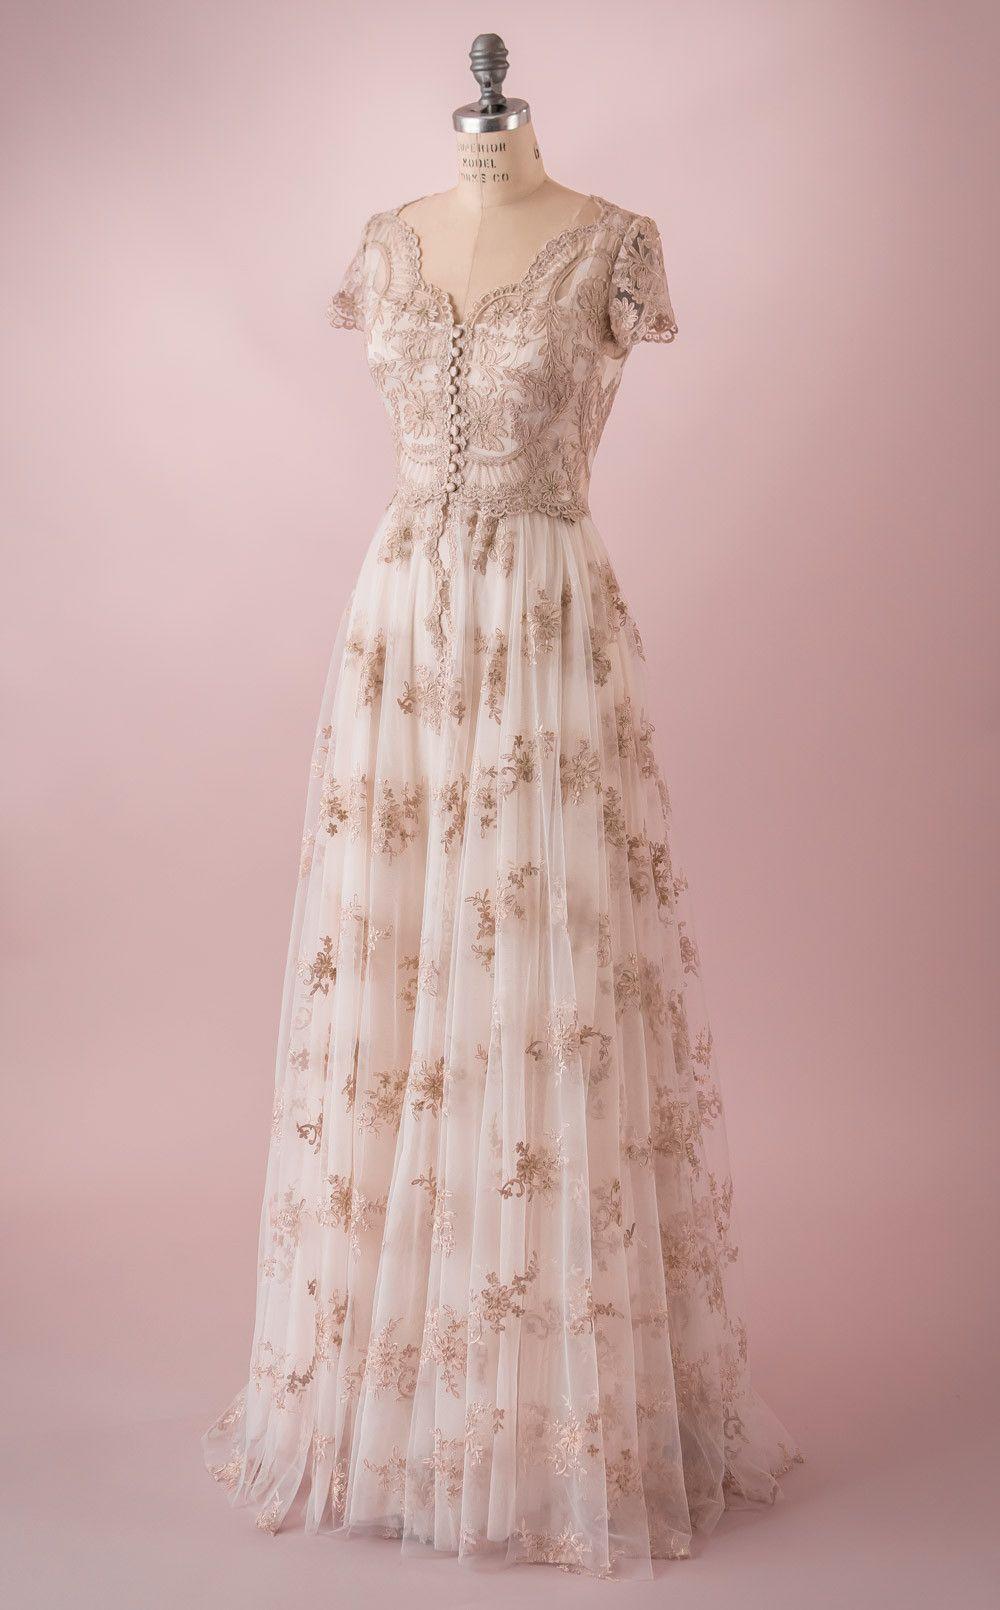 Elizabeth | Pinterest | Princess wedding dresses, Cap and Wedding dress